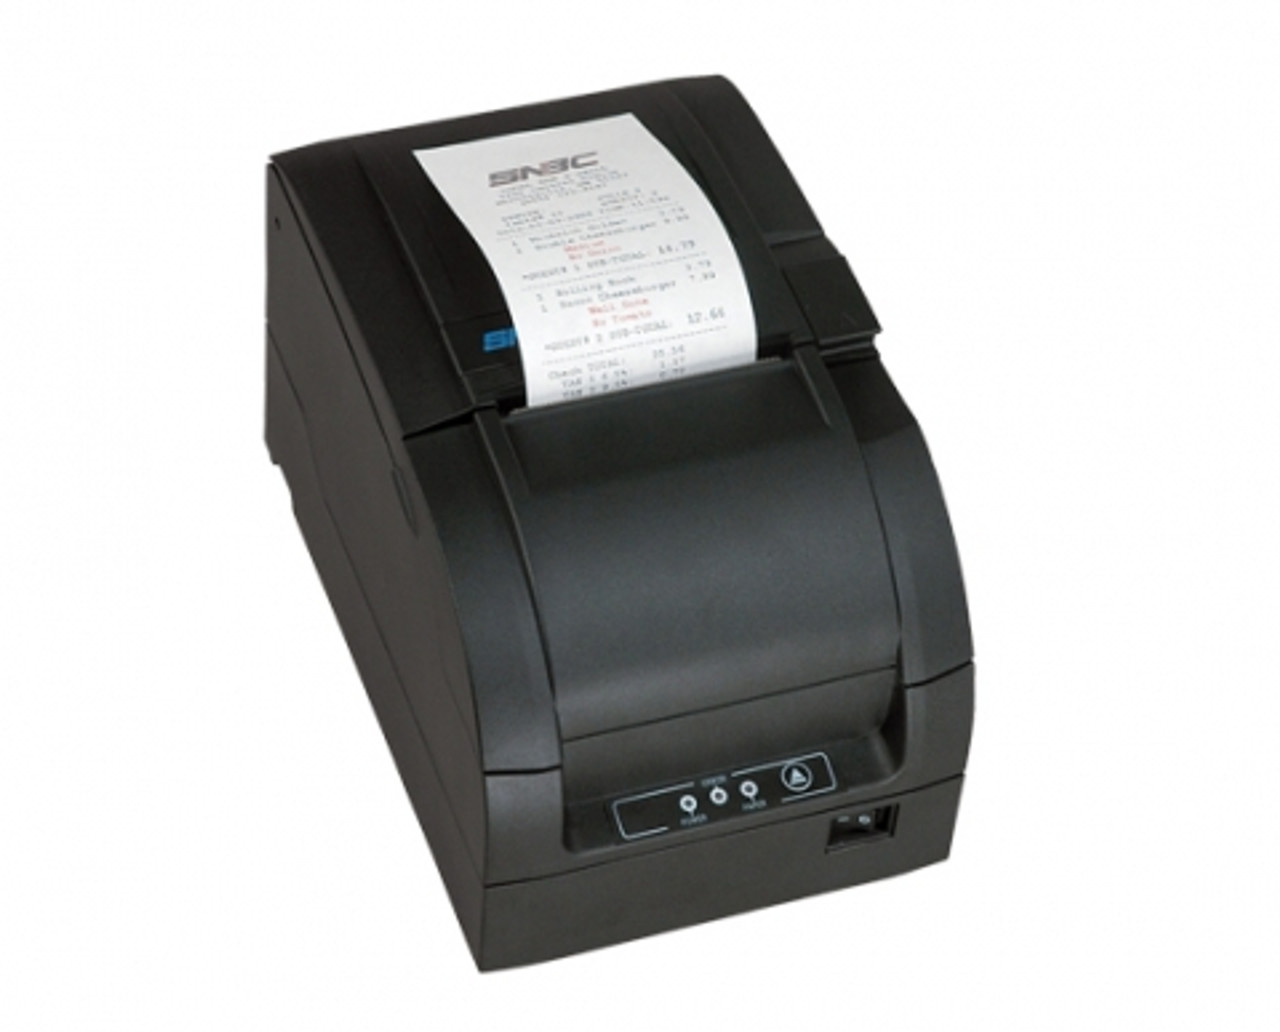 SNBC BTP-M300 Impact Receipt Printer, Ethernet, Black, 132083-E